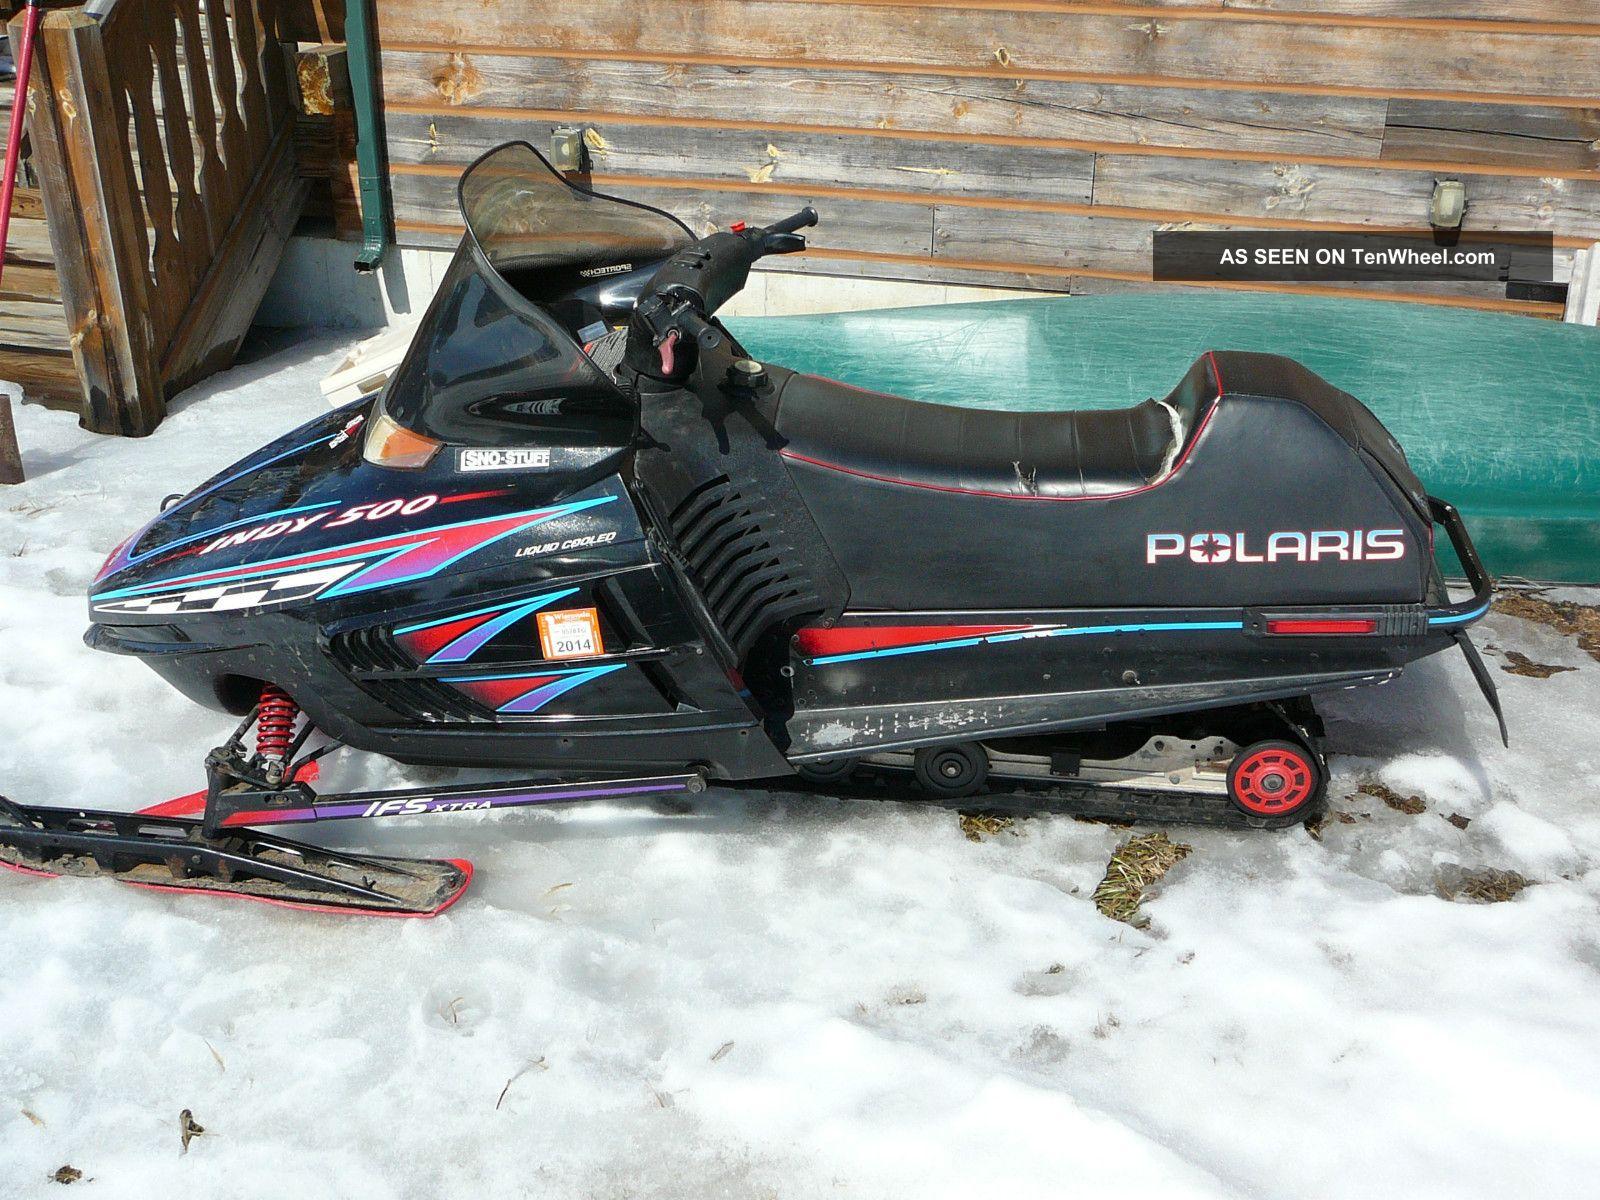 1996 Polaris Indy 500 Specs Sportsman Wiring Diagram Attachment 157319